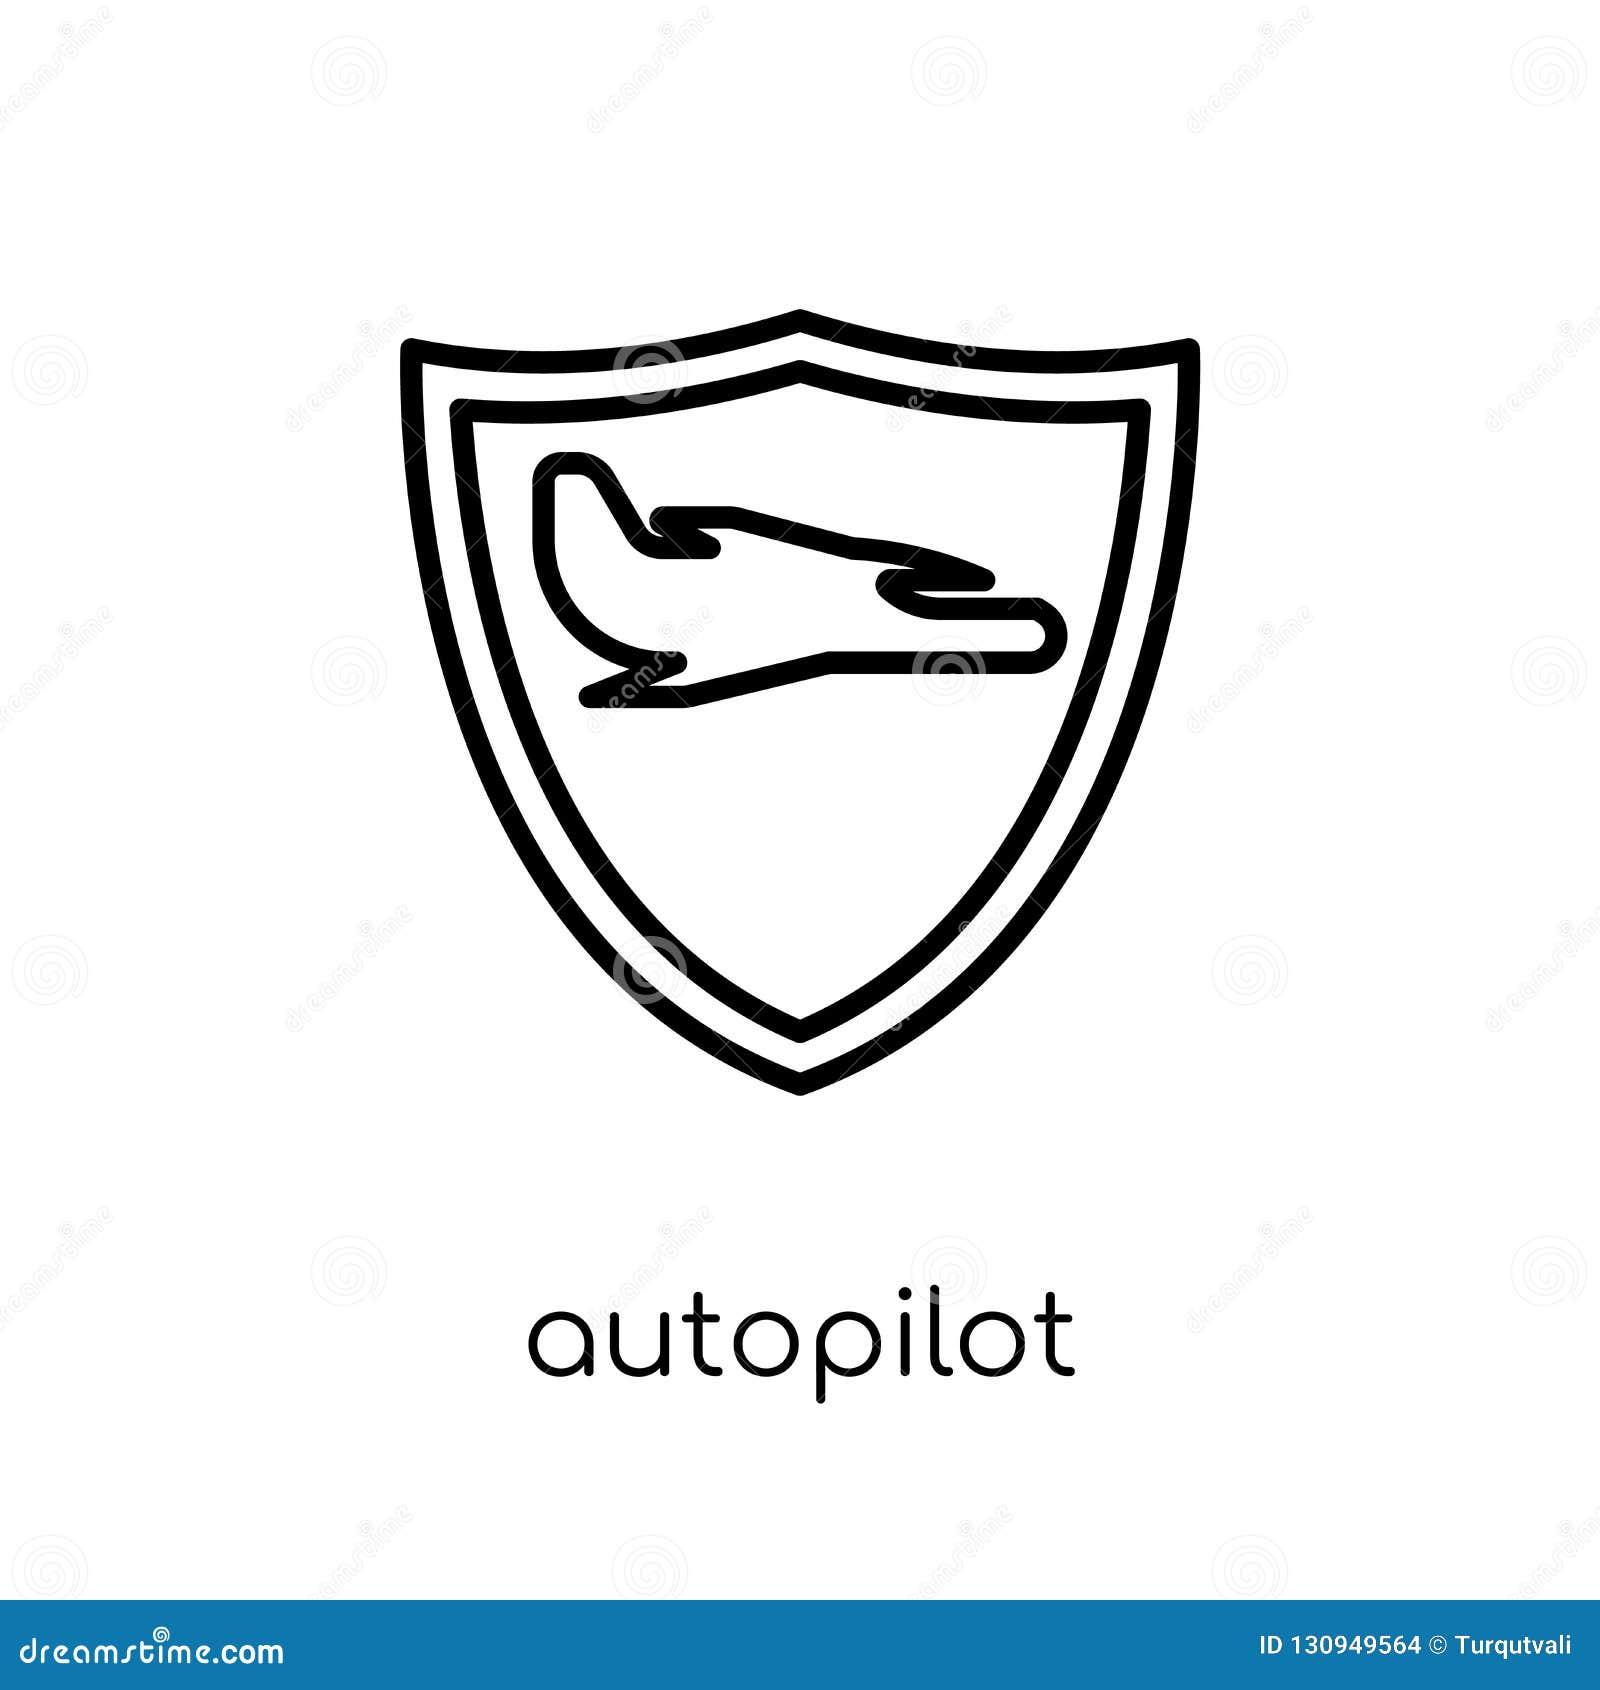 autopilot icon. Trendy modern flat linear vector autopilot icon